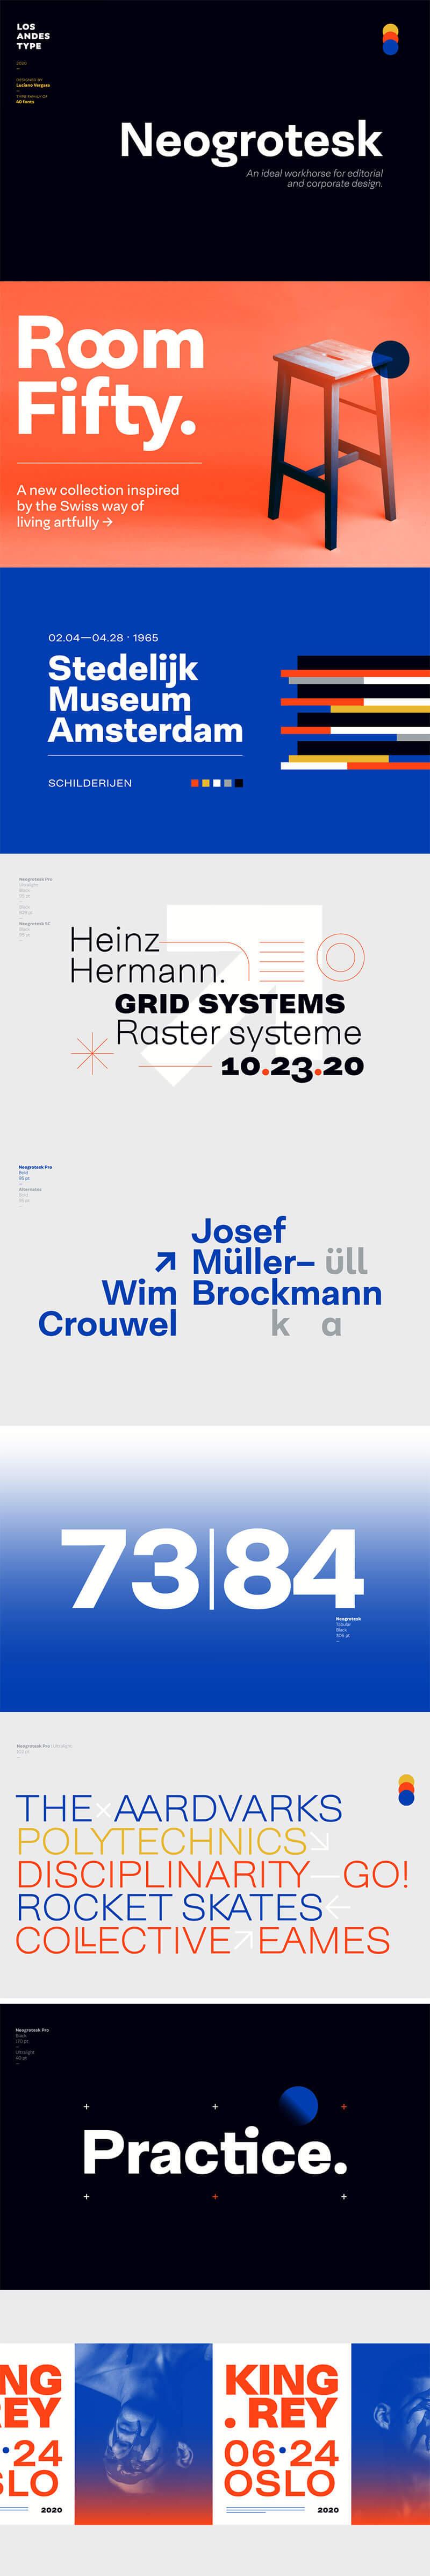 modern-designers-extensive-font-library-a-1